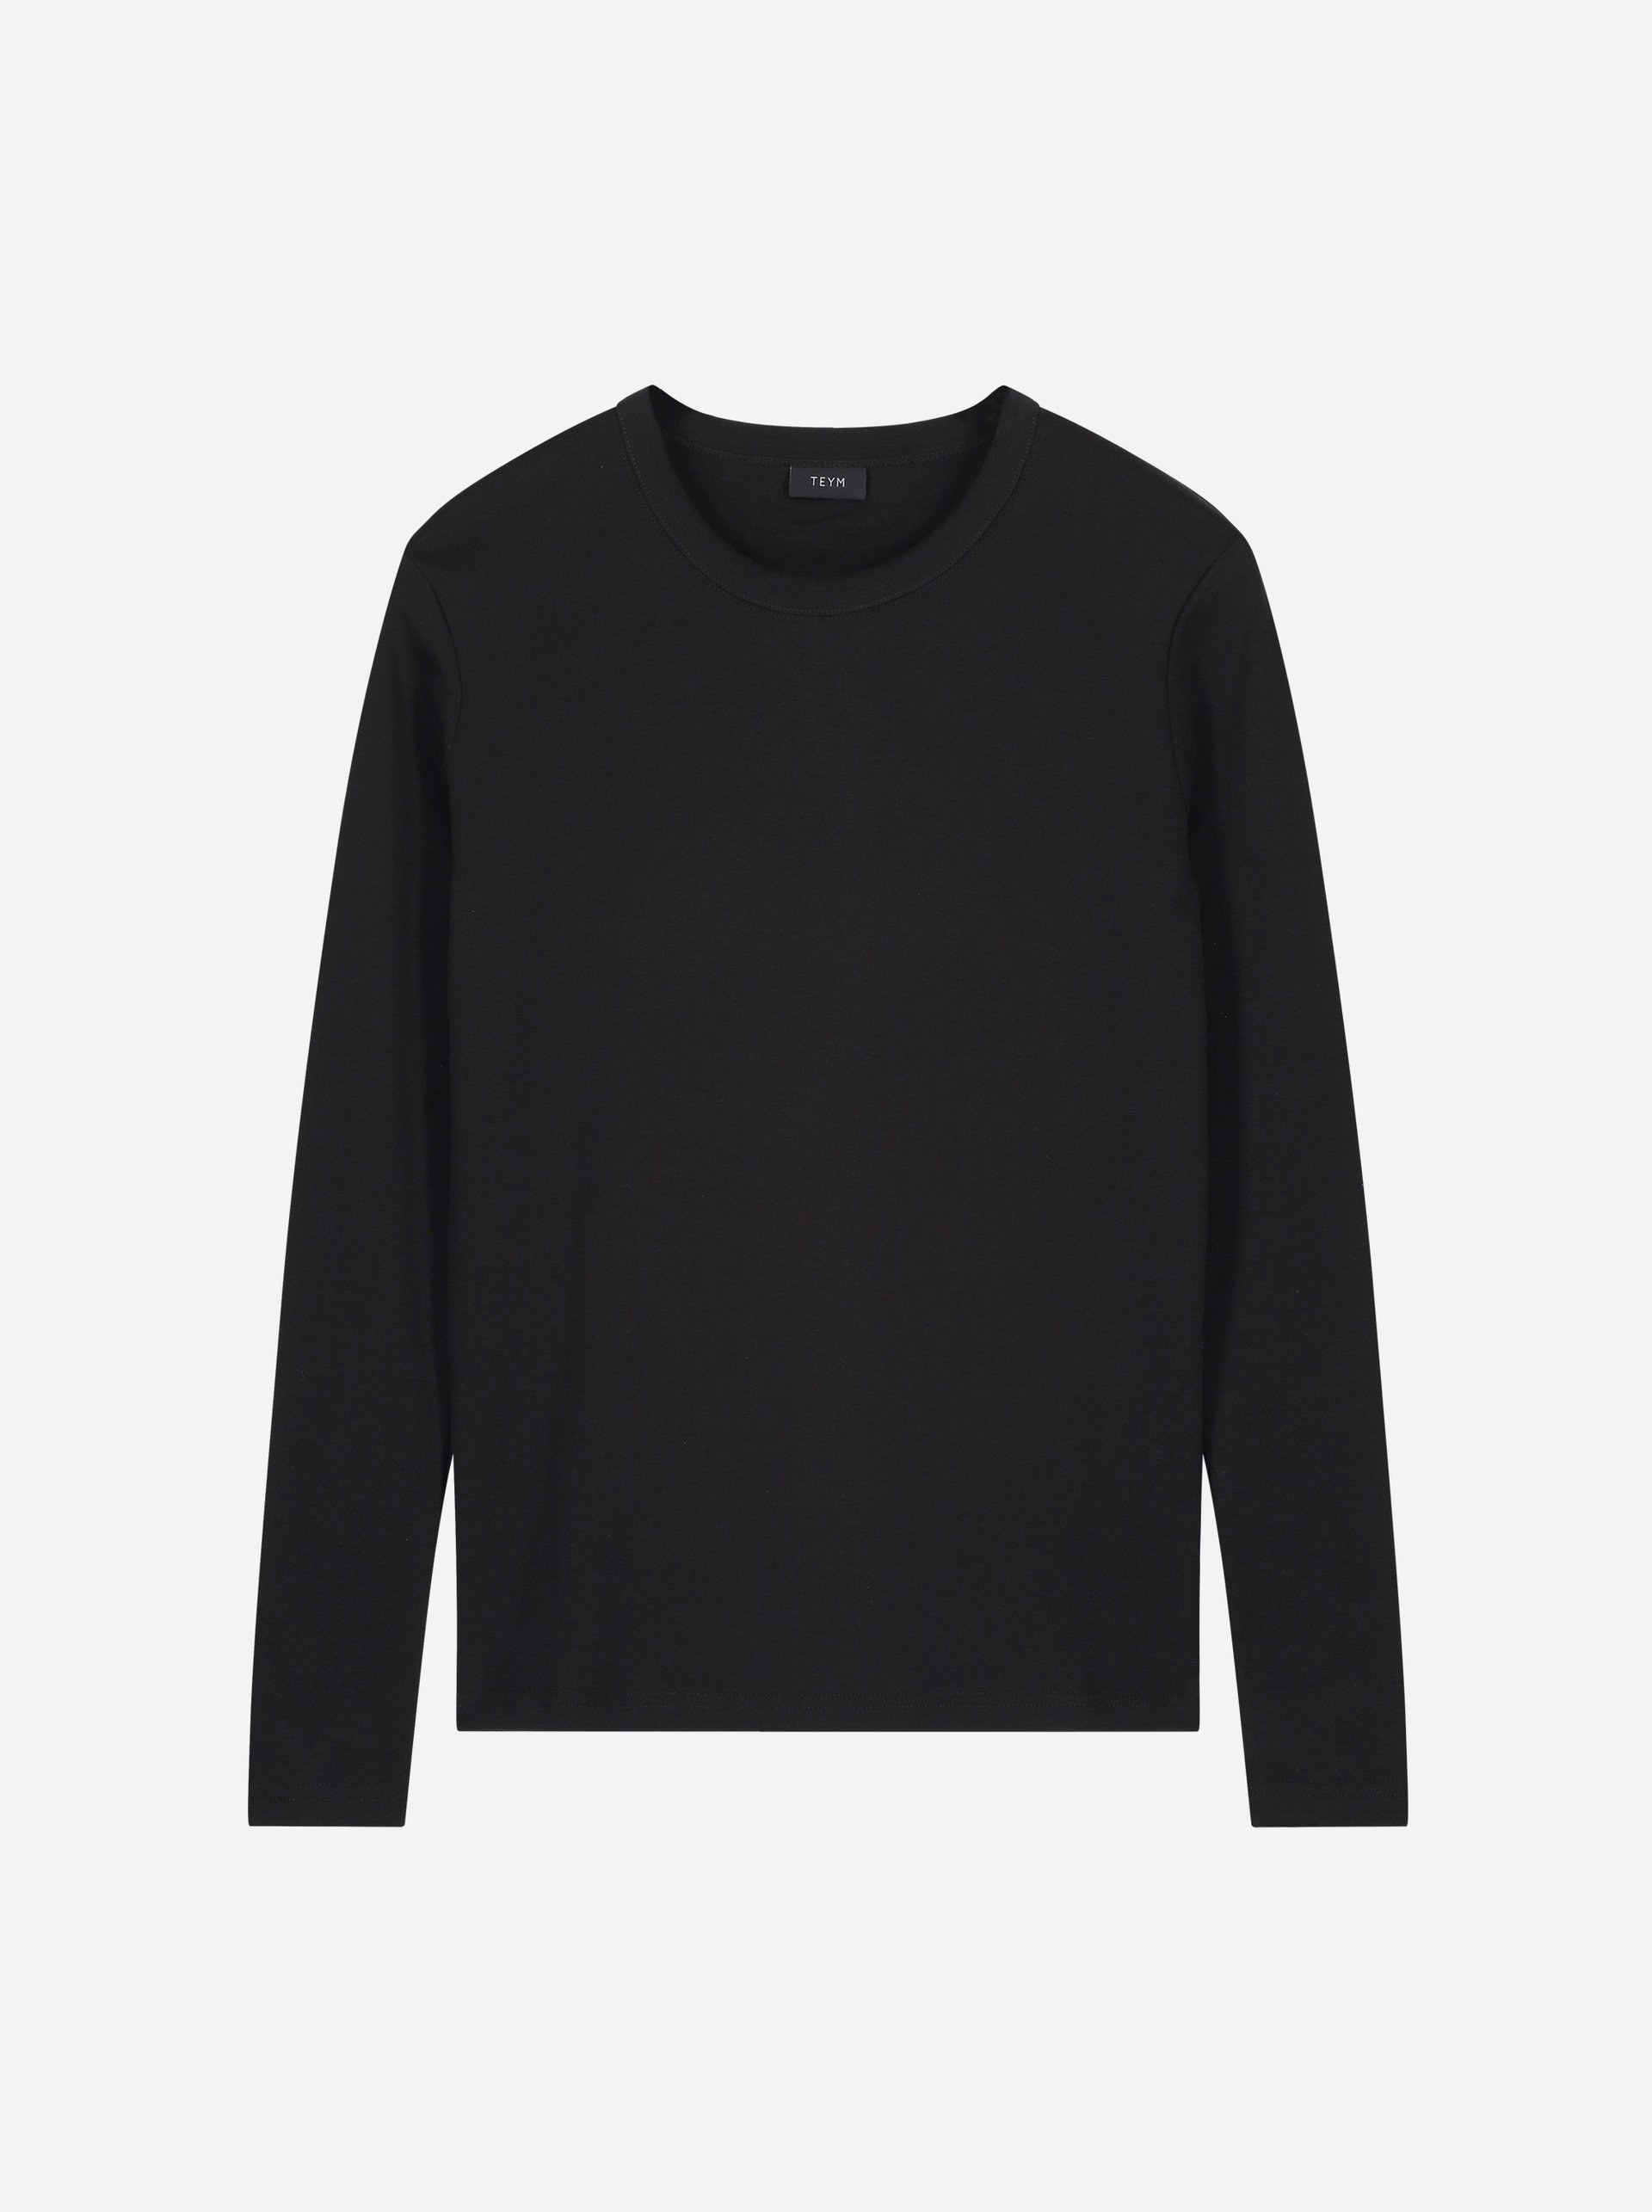 Teym - The-T-Shirt - Longsleeve - Women - Black - 5